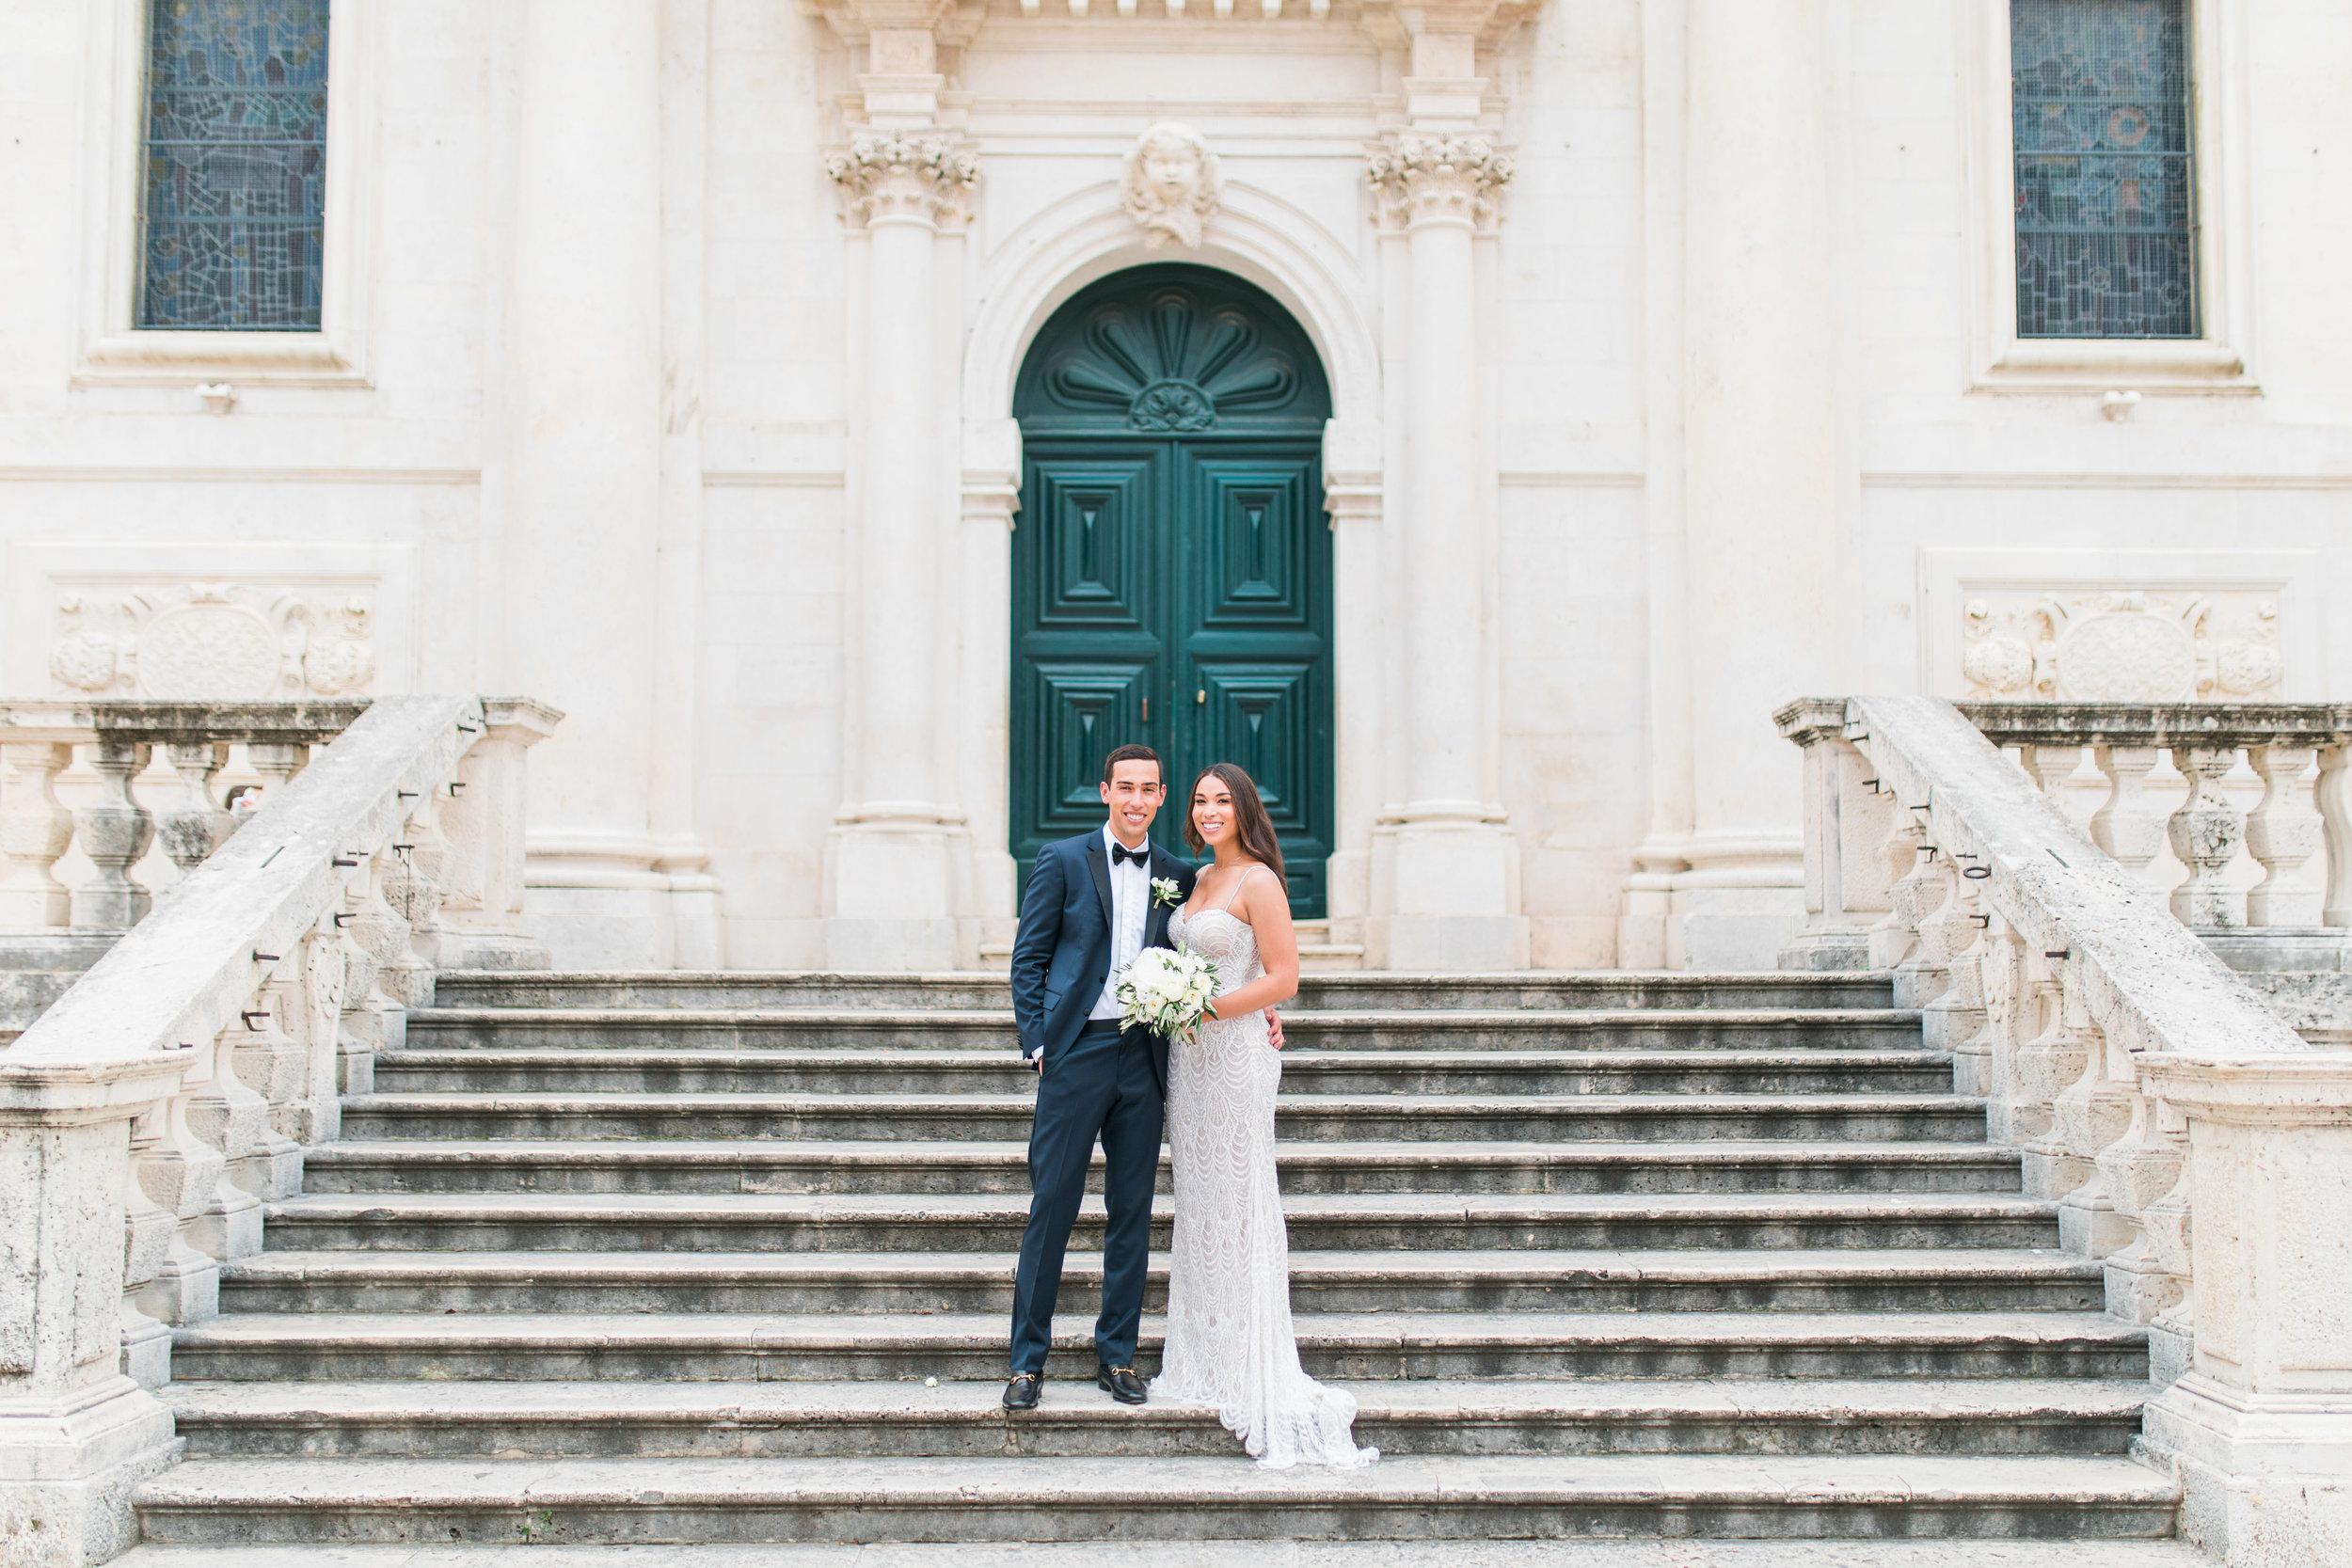 Dubrovnik-Wedding-Photographer-Croatia-Wedding-Photos-JBJ-Pictures-11.jpg